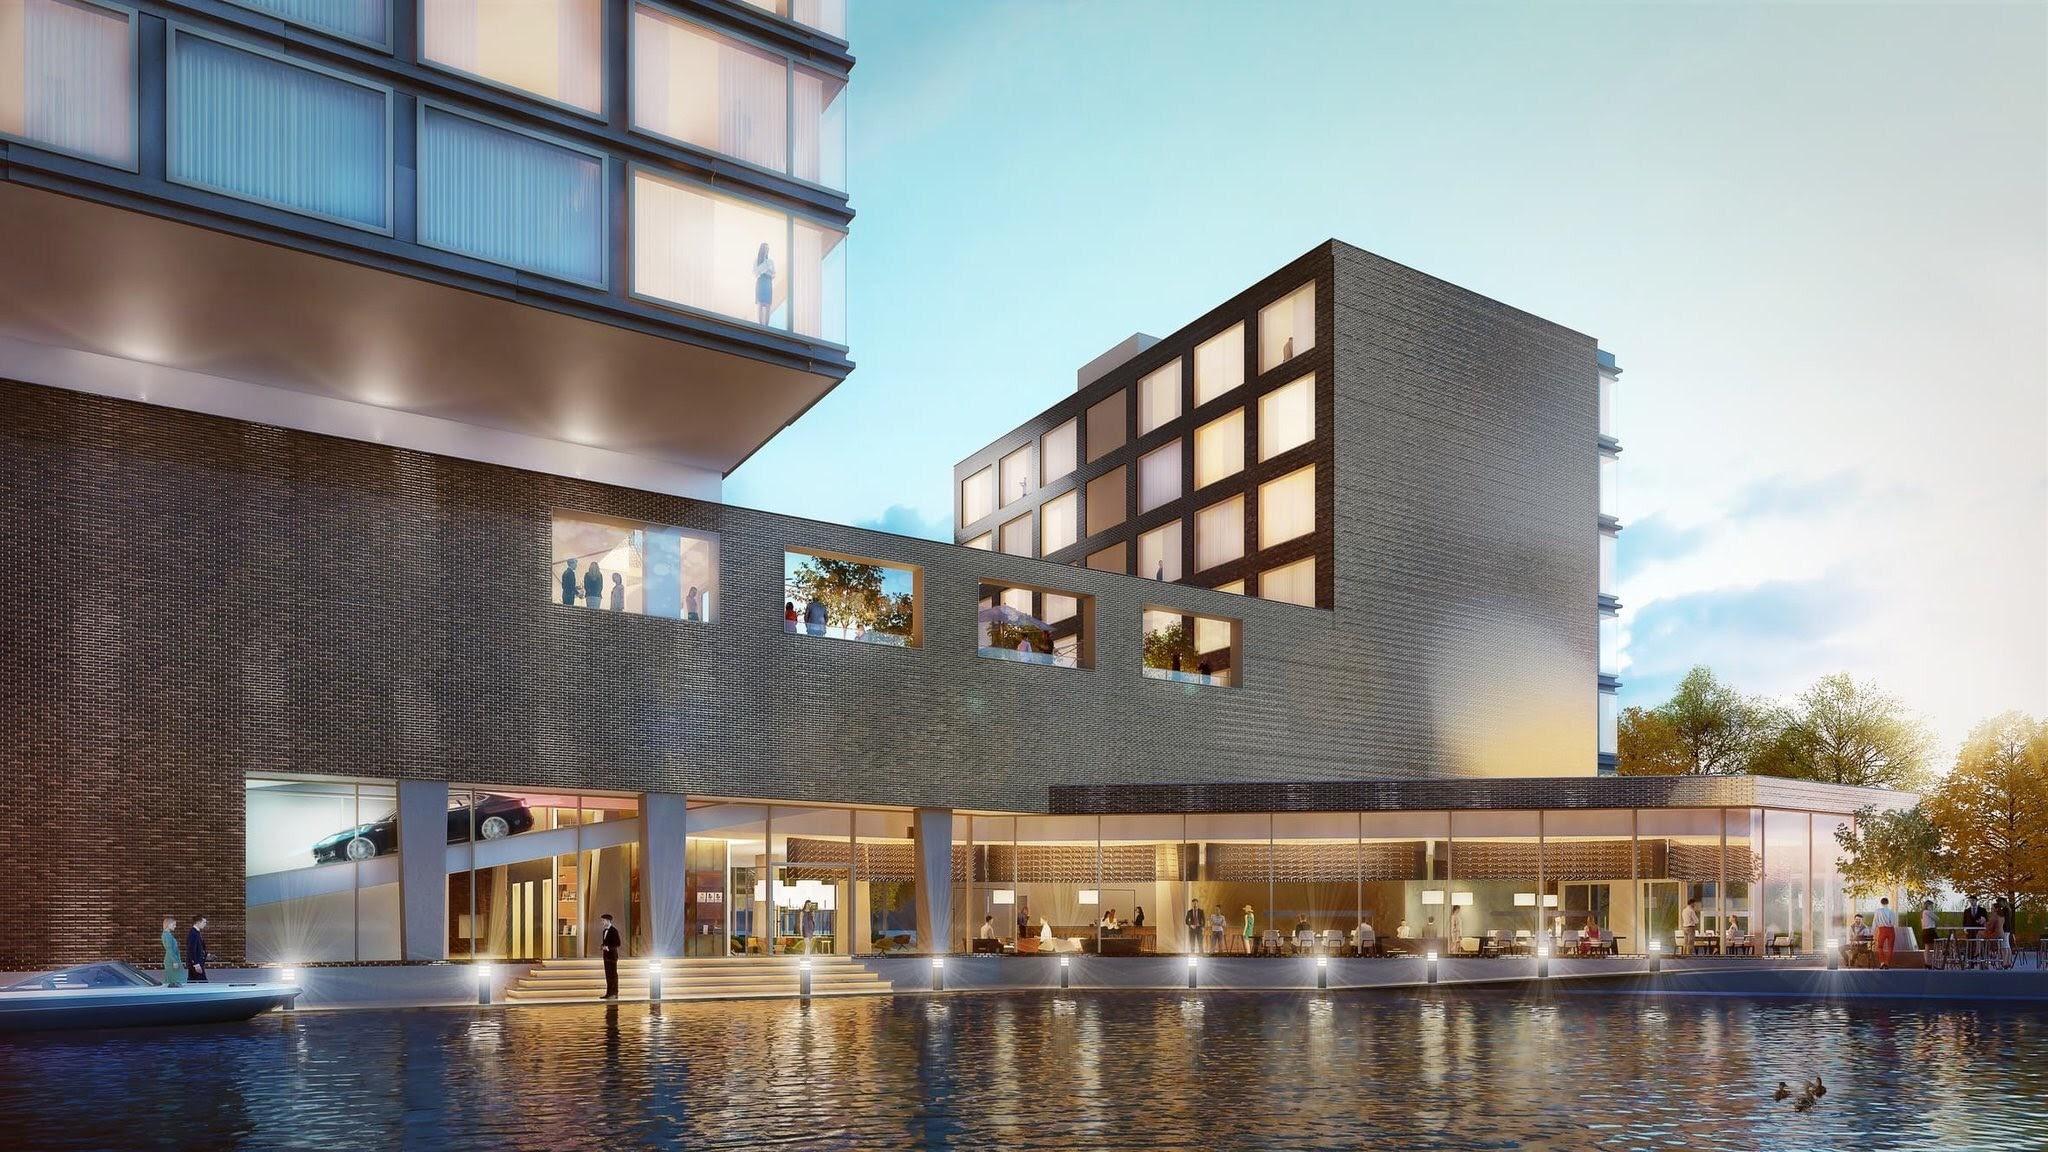 bouwfysisch advies olympic hotel nieman raadgevende. Black Bedroom Furniture Sets. Home Design Ideas